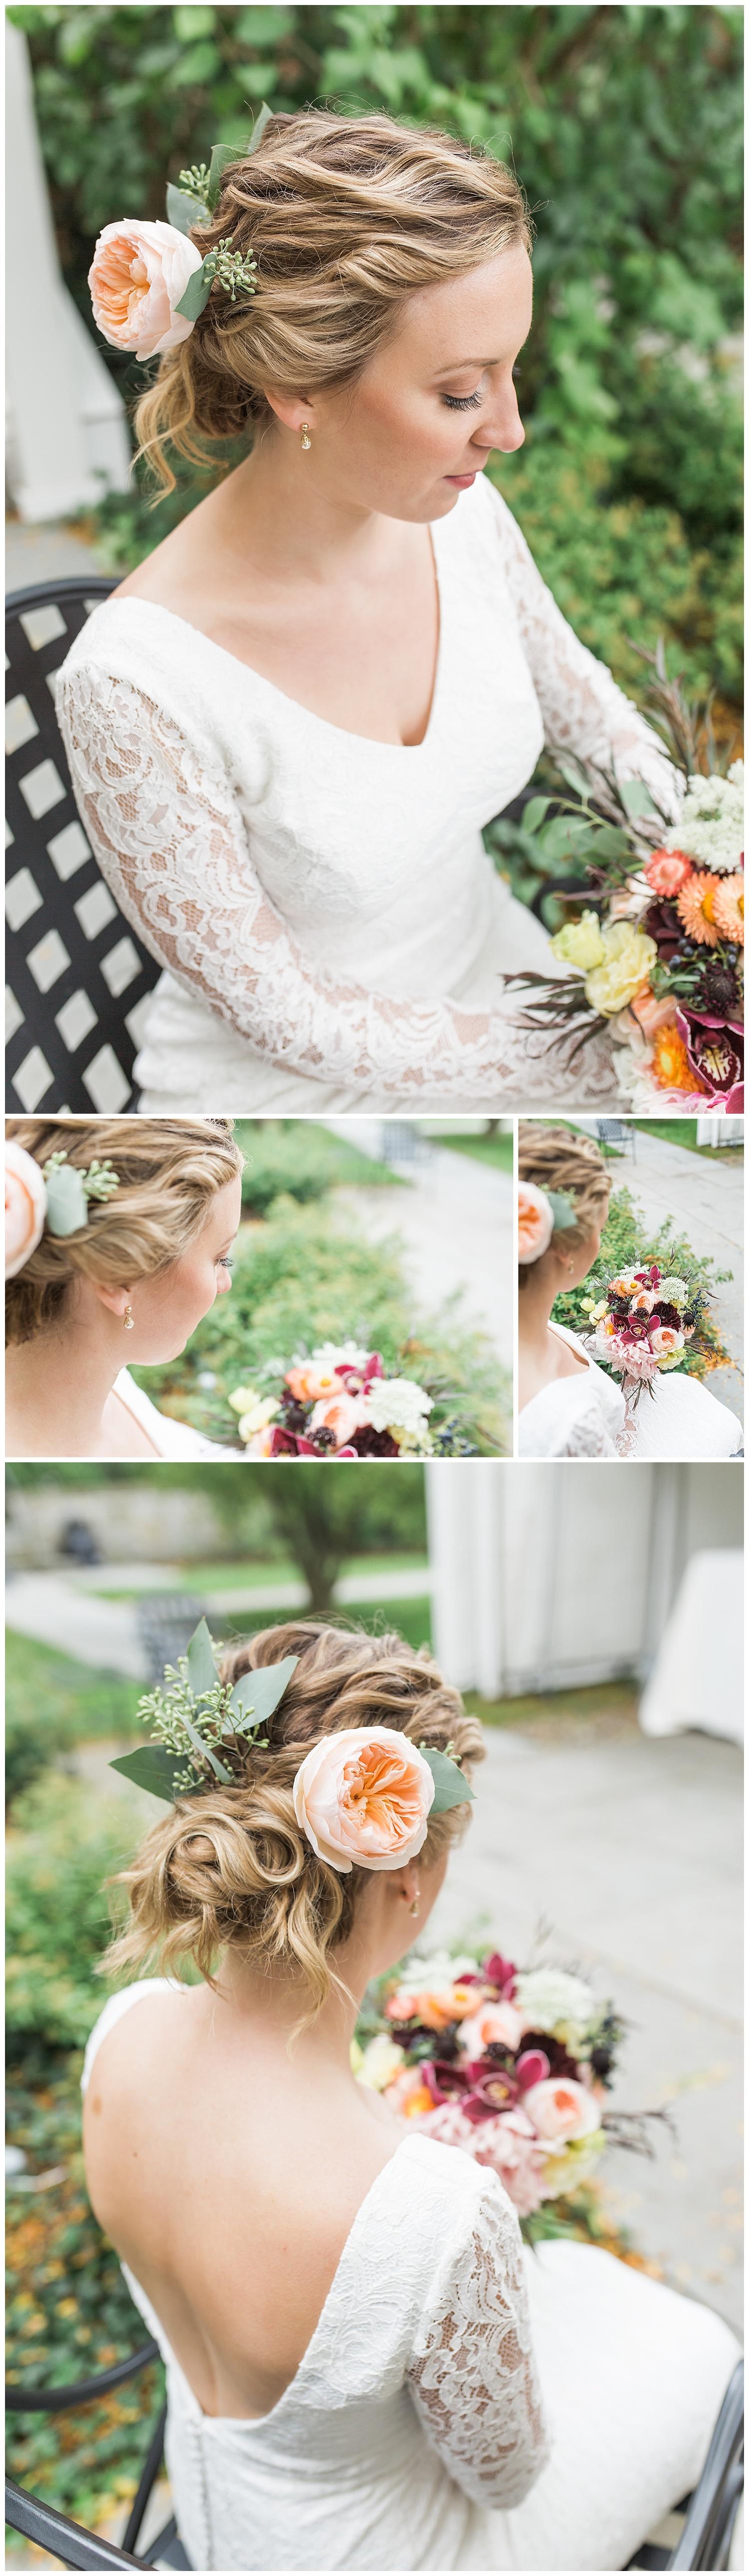 Margaret and Colin - Inns of Aurora - Lass and Beau-900_Buffalo wedding photography.jpg